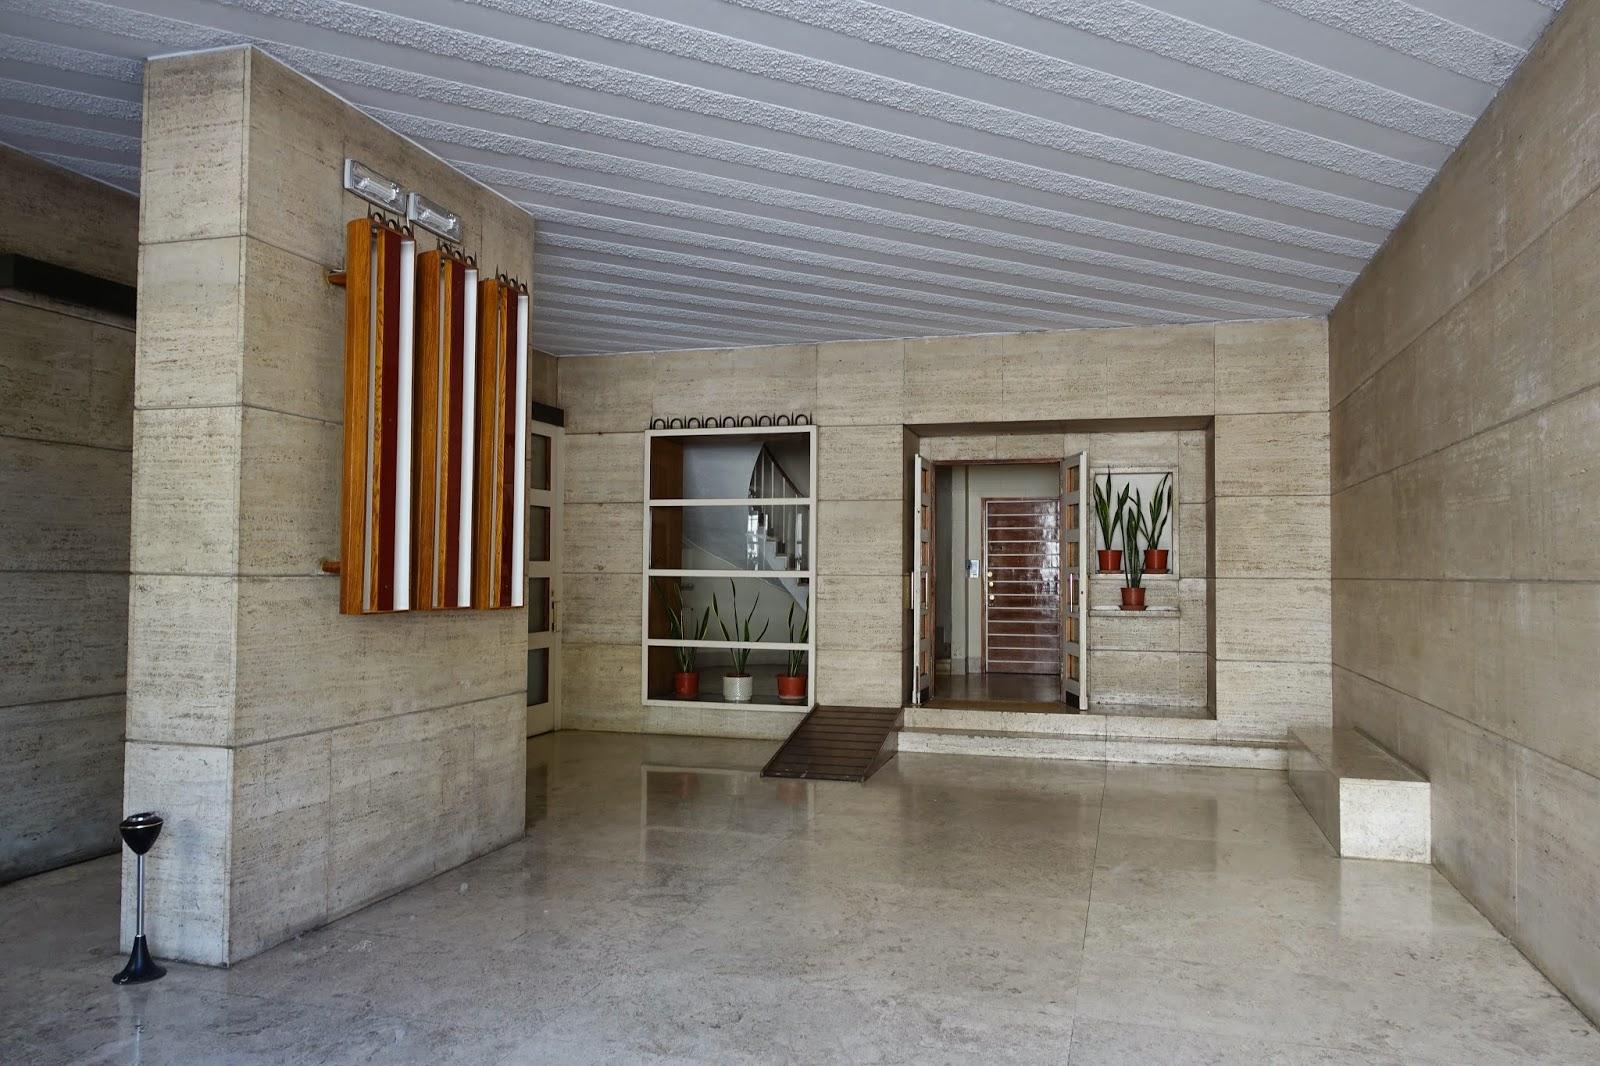 Apartment Foyer S : Apartment building entryway pixshark images